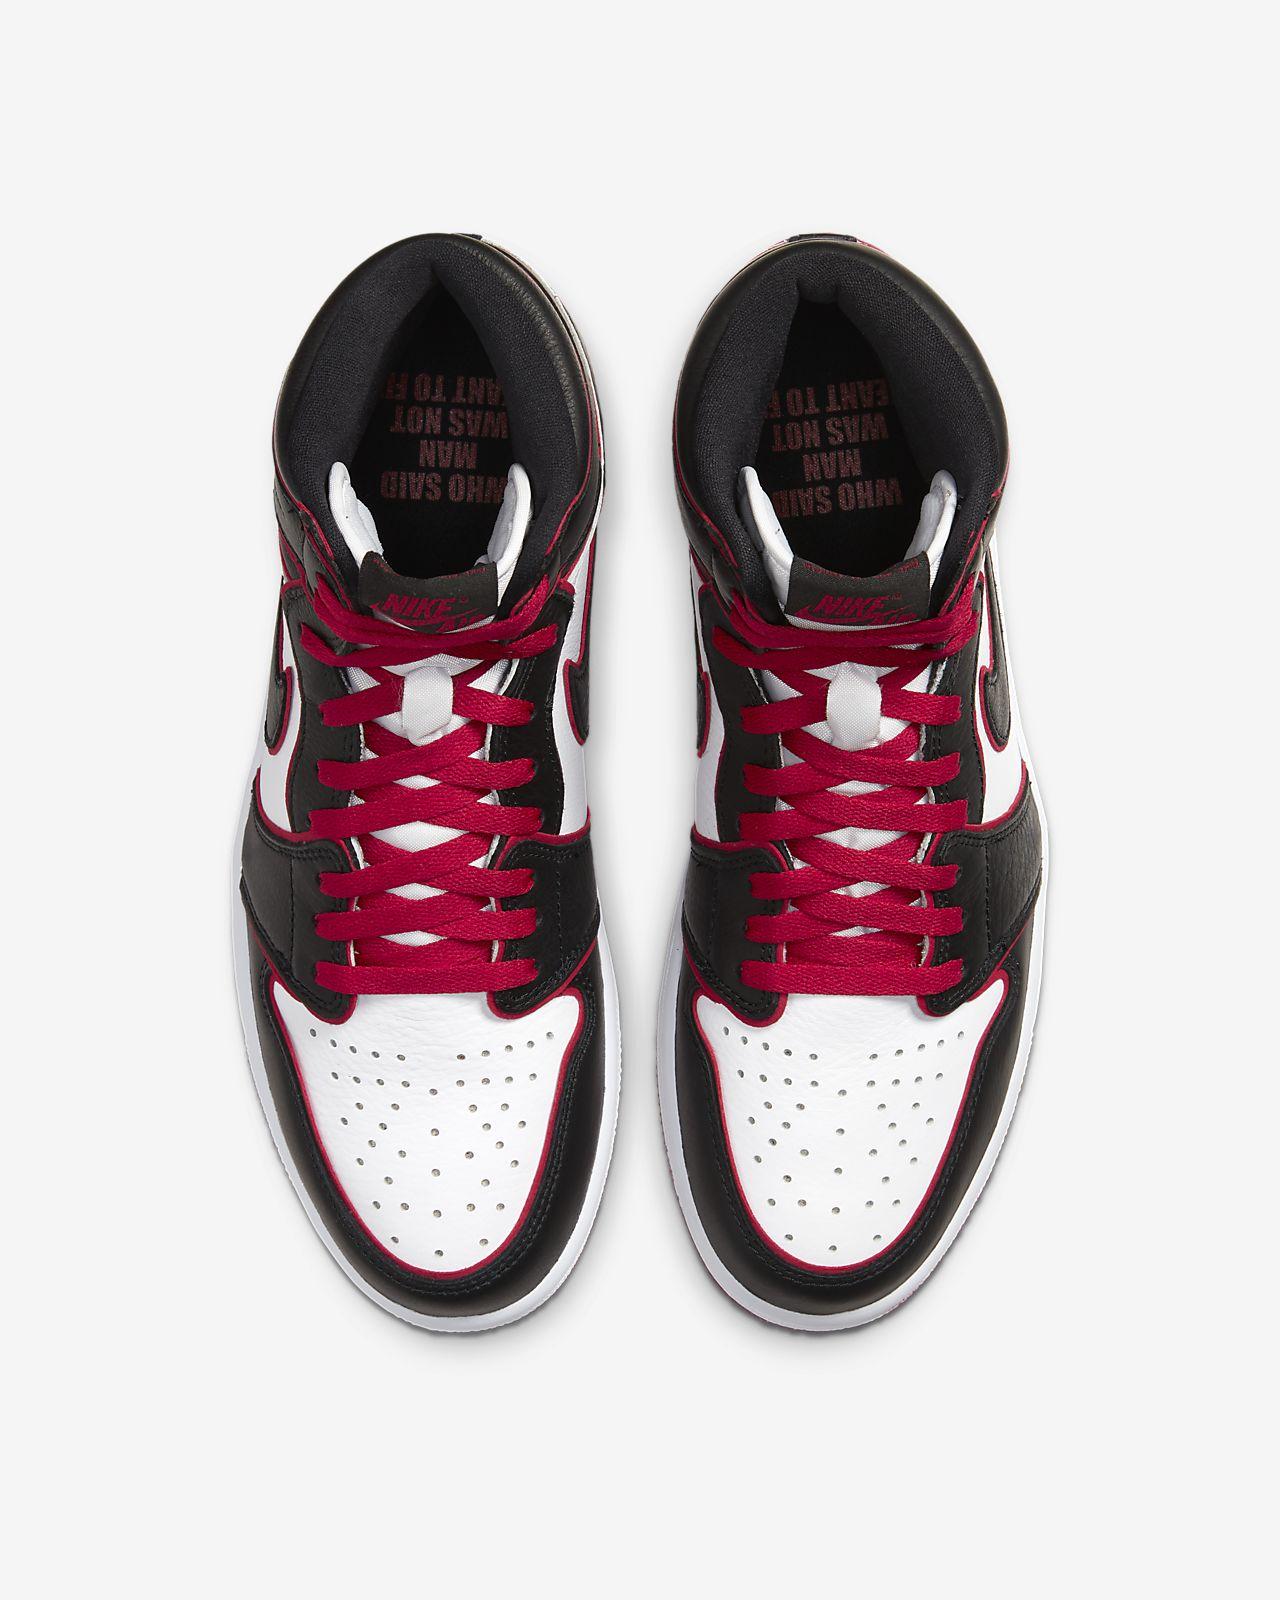 Calidad Oficial Compre Por Mayor Nike LeBron 8 V2 King James